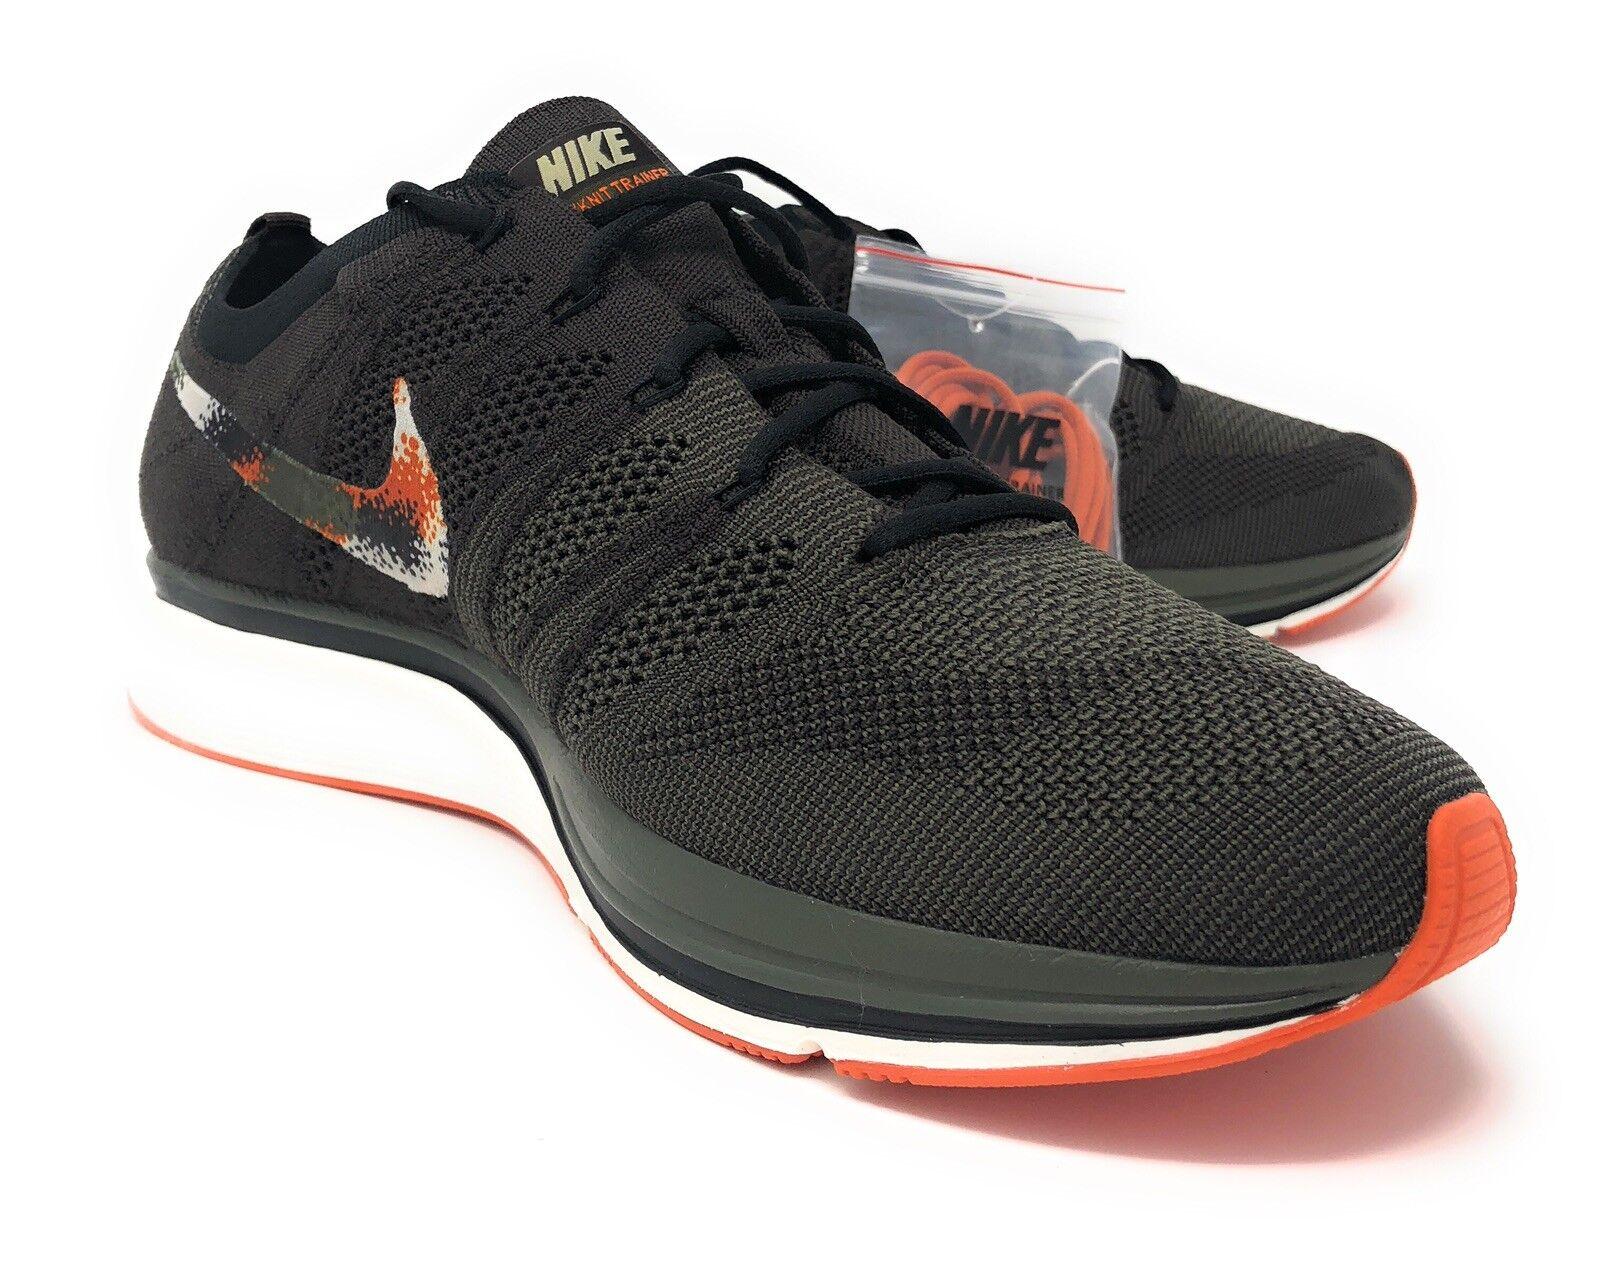 0e2675def0cbb Nike Flyknit Trainer Velvet Brown Brown Brown Neutral Olive - AH8396-202  Size 10.5 Men s